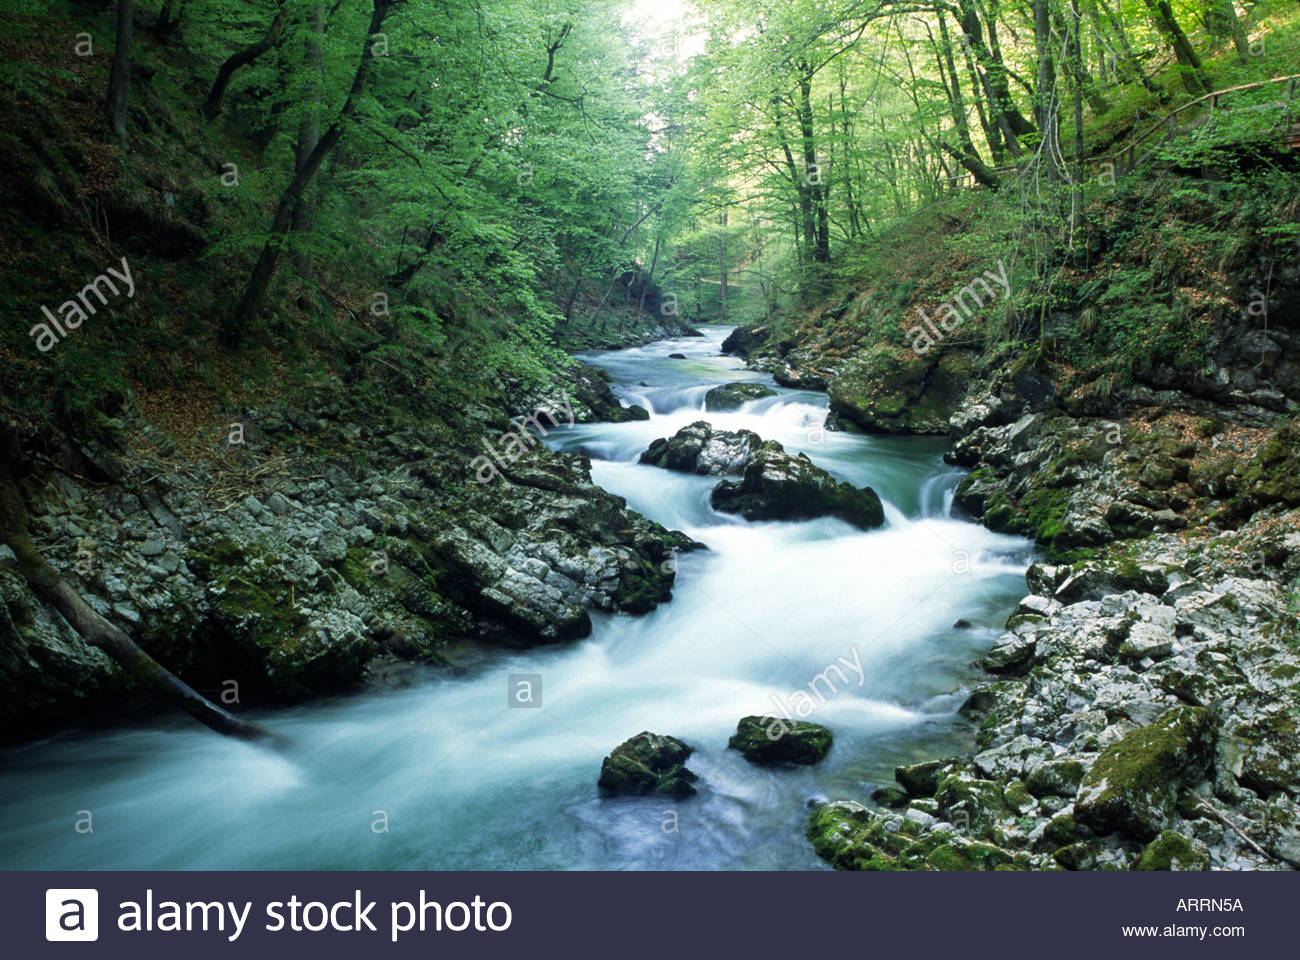 bled-slovenia-blejski-vintgar-a-gorge-ma